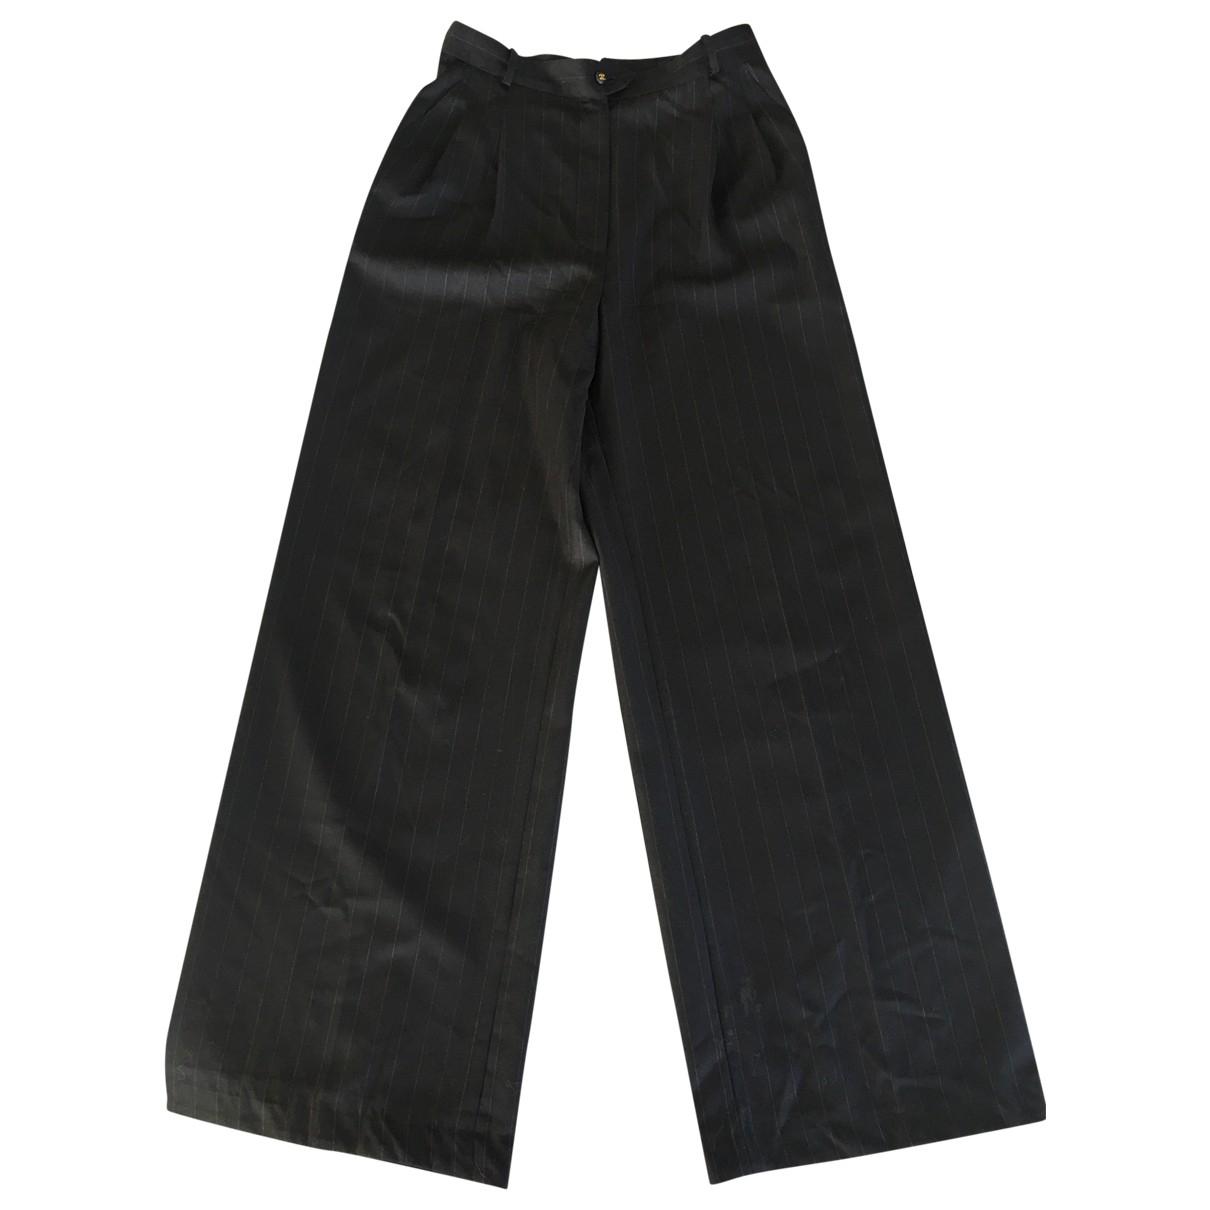 Pantalon de Lana Chanel